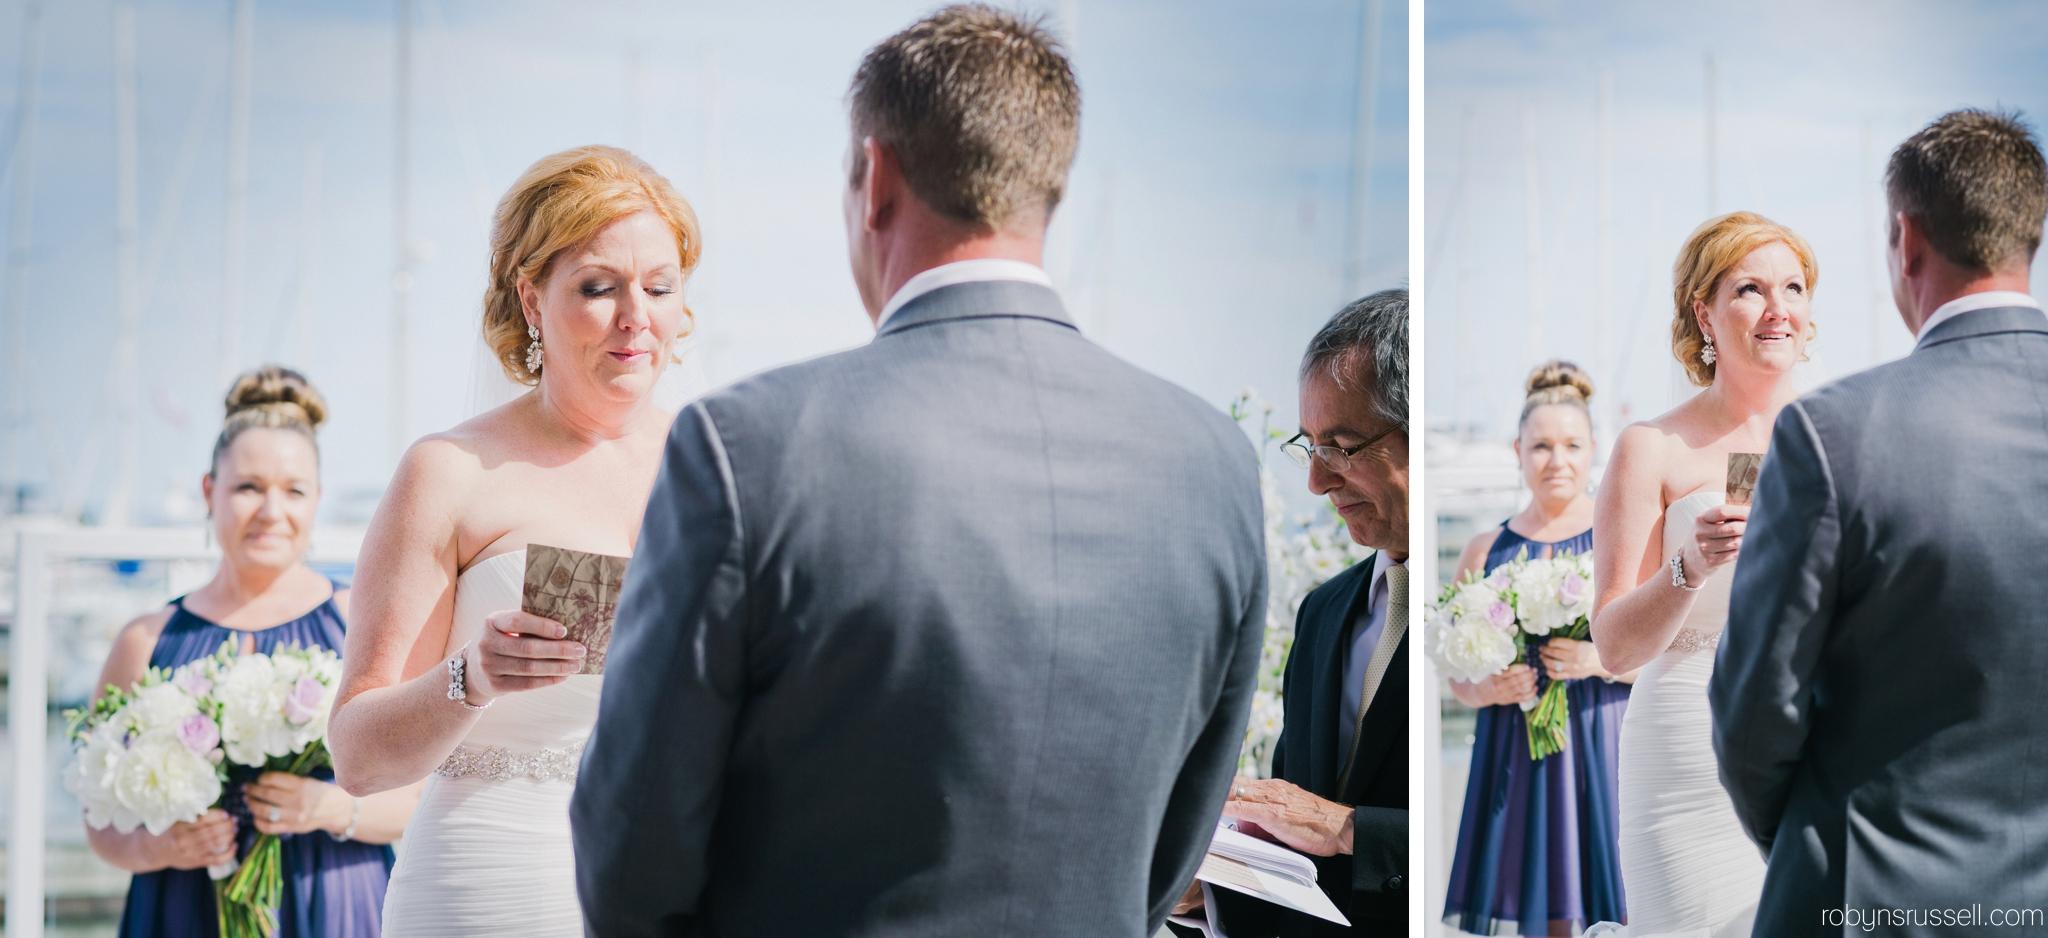 15-wedding-vows-oakville-wedding-photographer.jpg